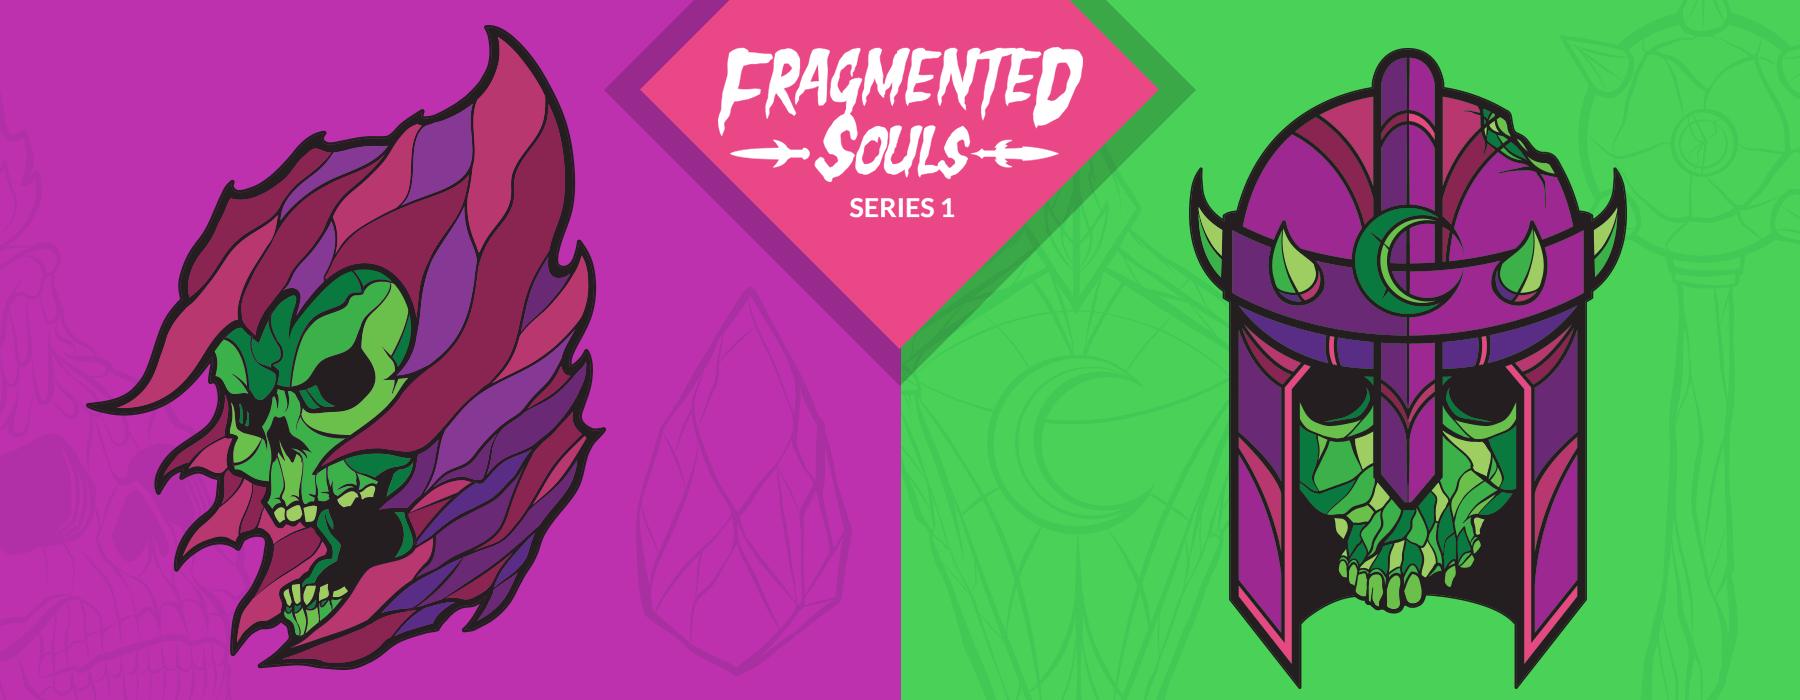 Fragmented Souls